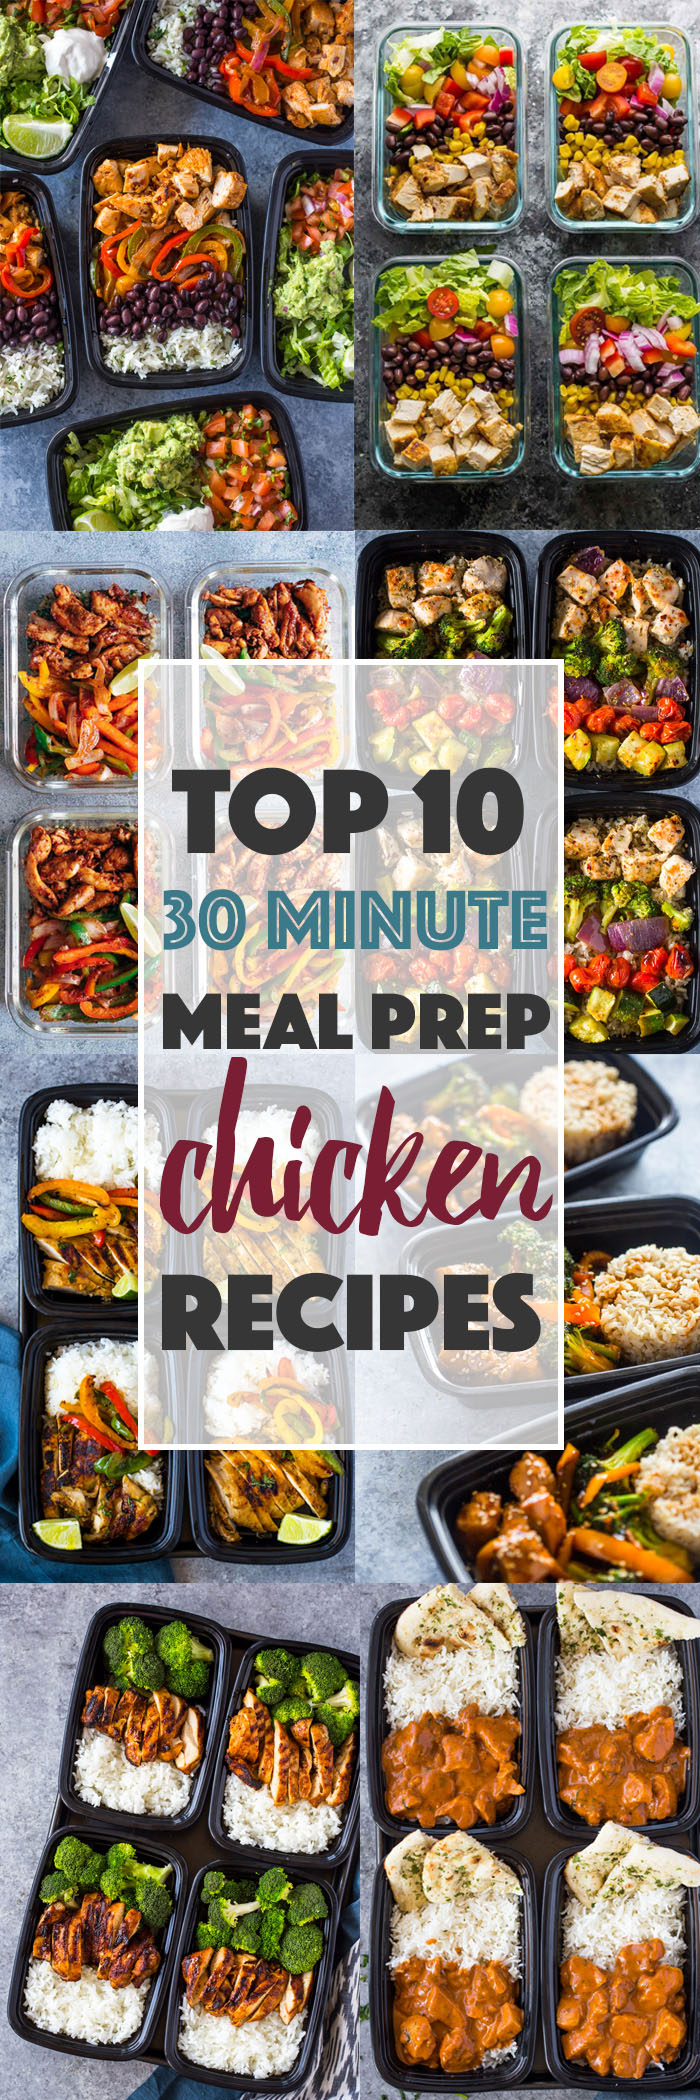 Top 10 (30 Minute) Meal-prep Chicken Recipes #healthy #mealprep #recipes #top #best #quick #mealprepping